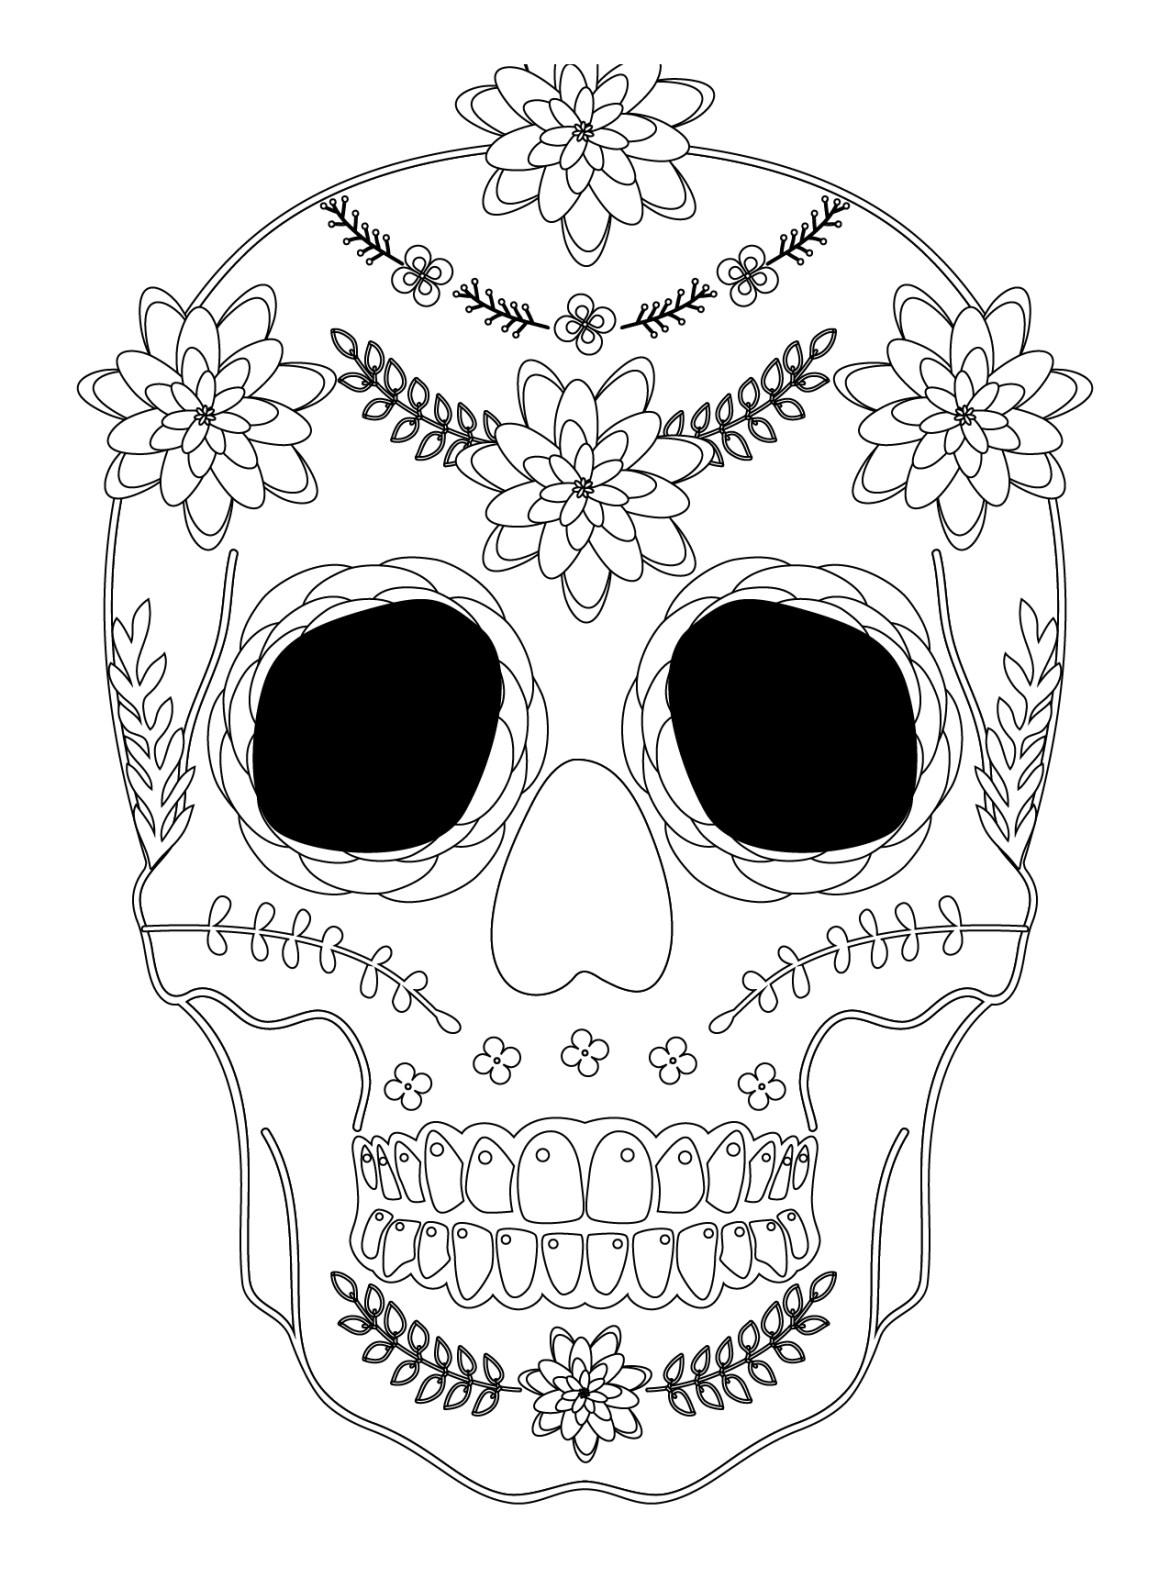 Sugar skull coloriage halloween a imprimer qui fait peur - Dessin halloween a imprimer qui fait peur ...